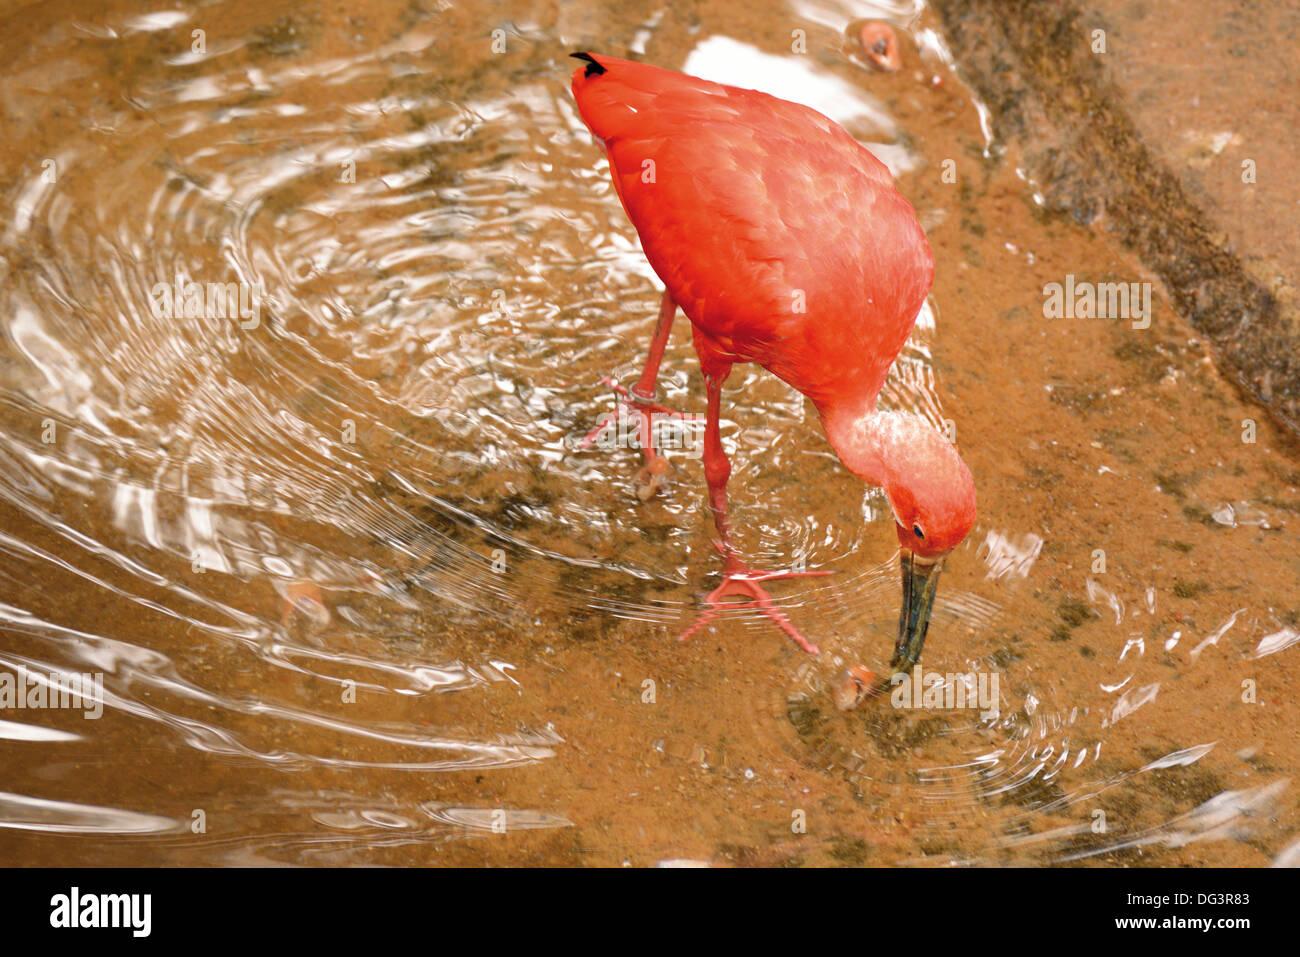 Brazil, Foz do Iguacu: Scarlet Ibis (Eudocimus ruber) in the bird´s refugee Parque das Aves - Stock Image